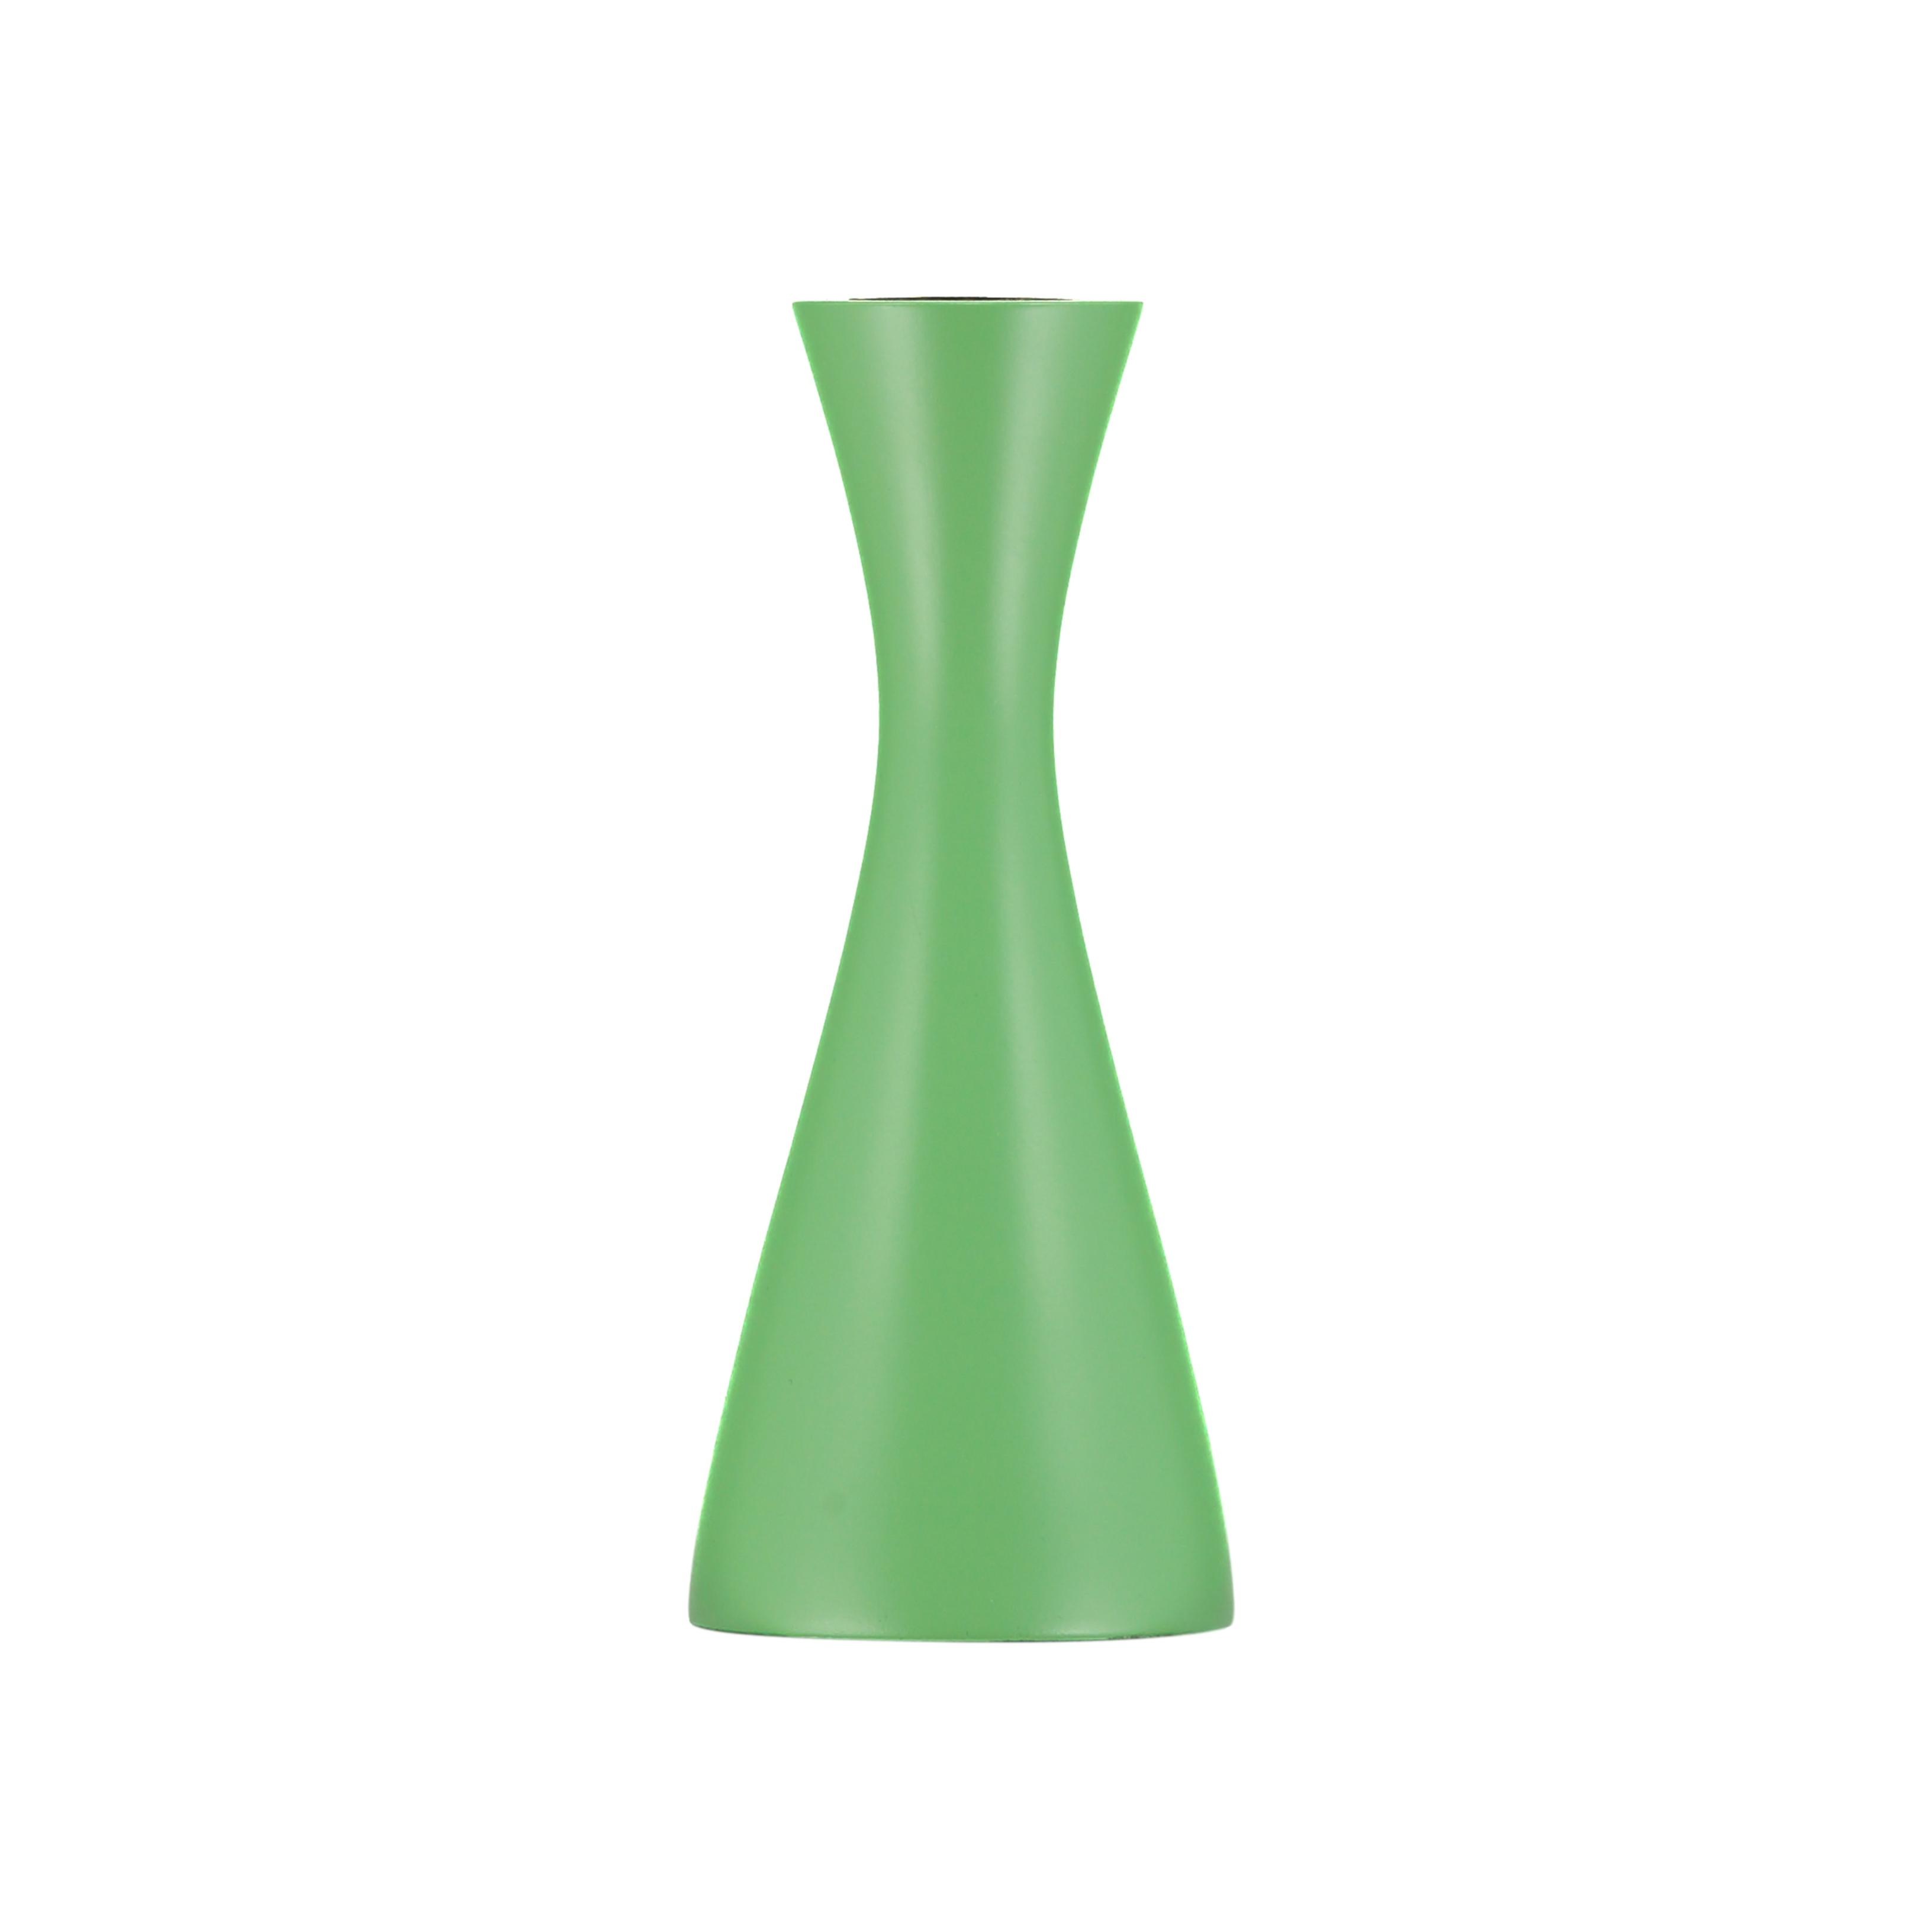 Opaline Green Medium Candle Holder by British Colour Standard